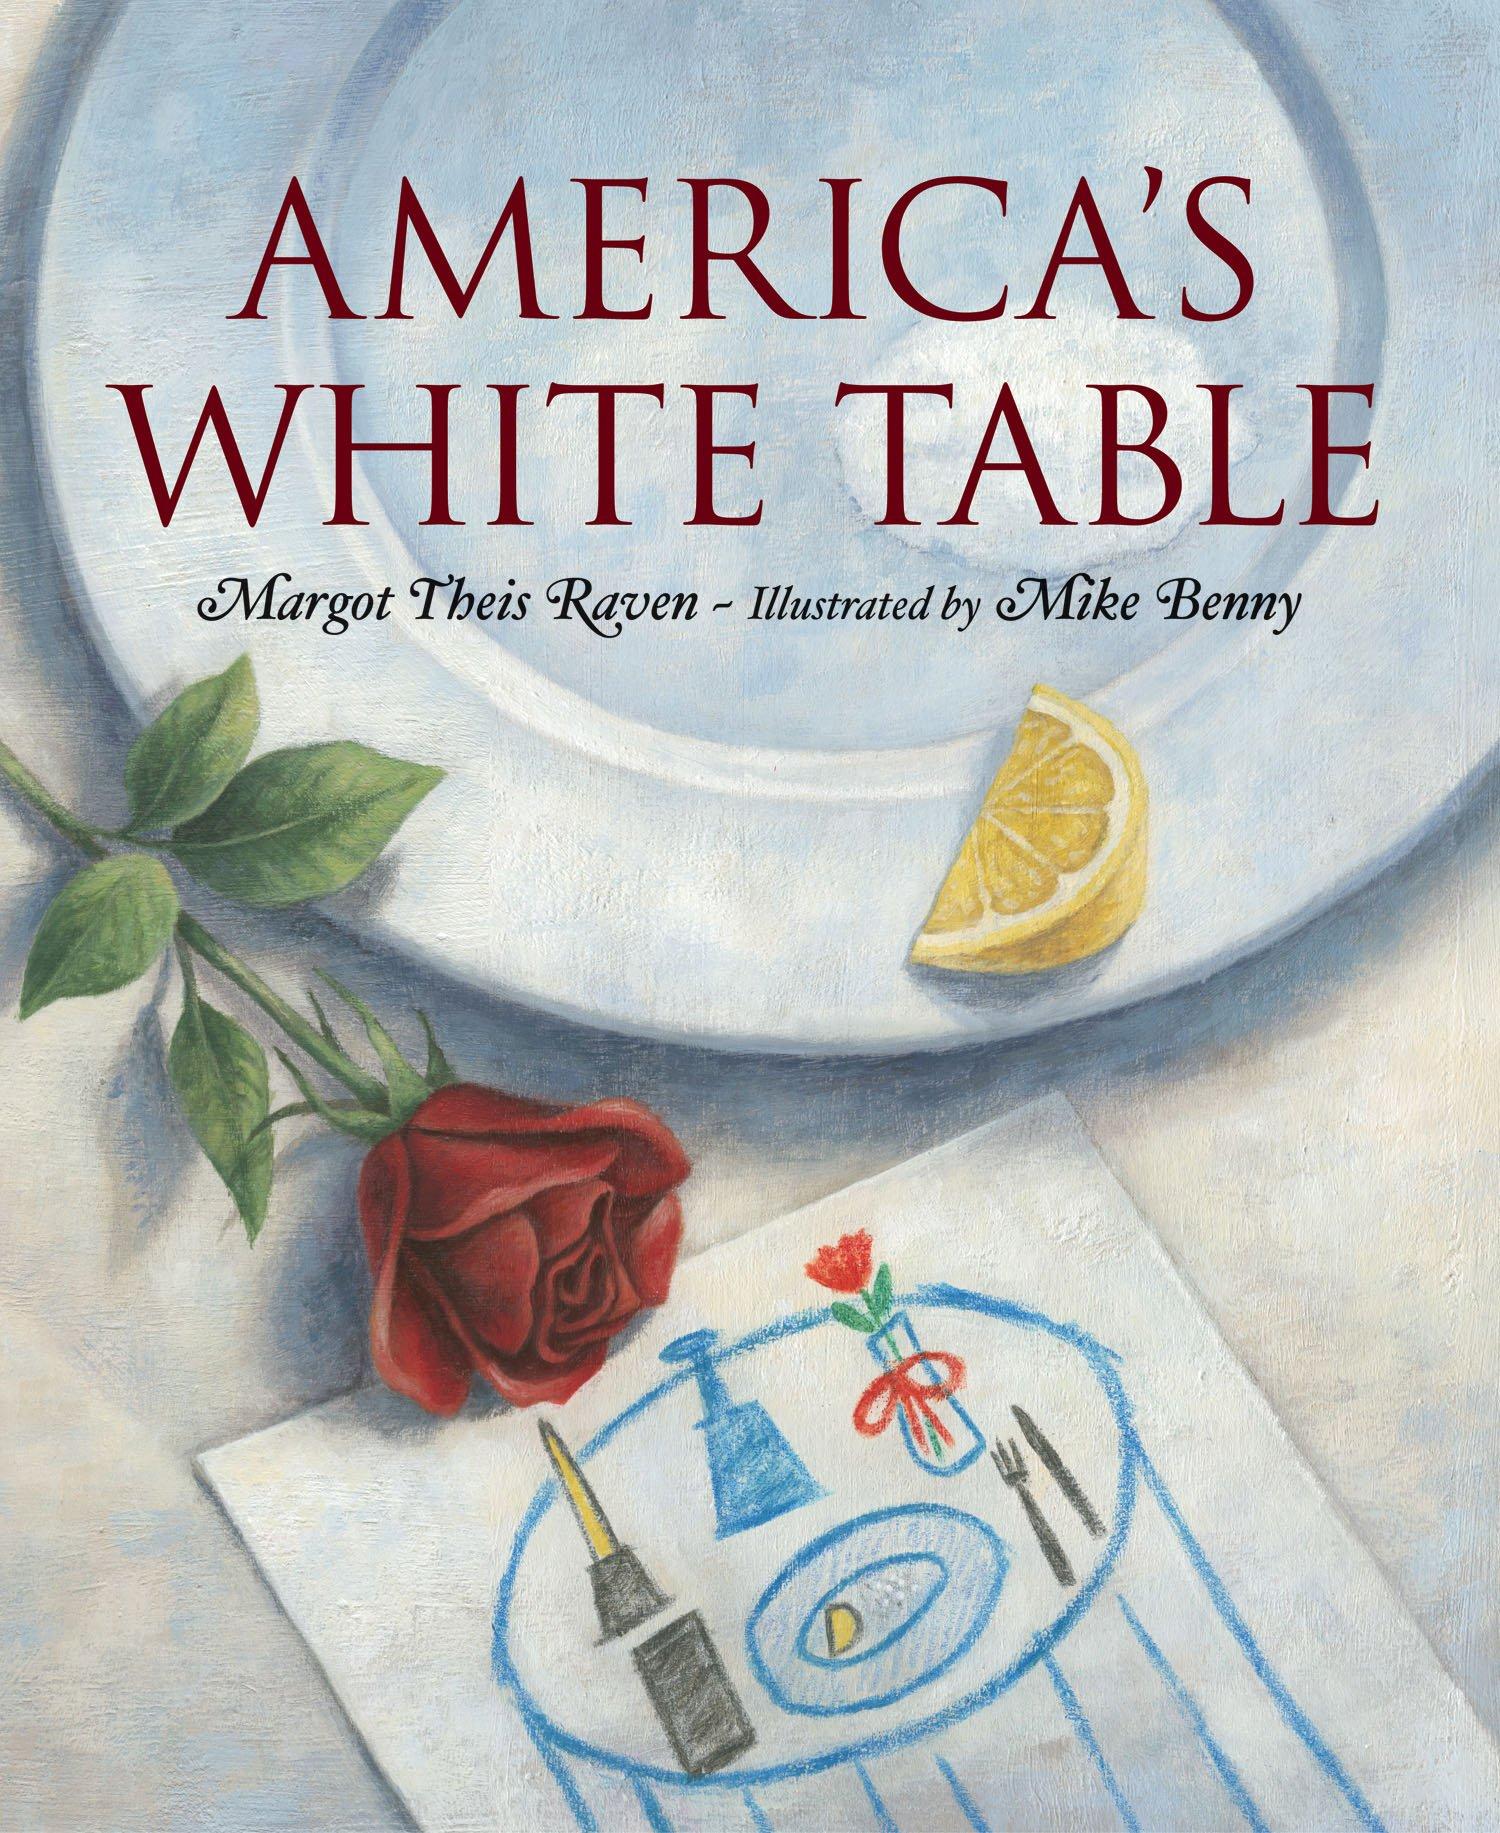 Americau0027s White Table Margot Theis Raven Mike Benny 9781585362165 Amazon.com Books  sc 1 st  Amazon.com & Americau0027s White Table: Margot Theis Raven Mike Benny: 9781585362165 ...